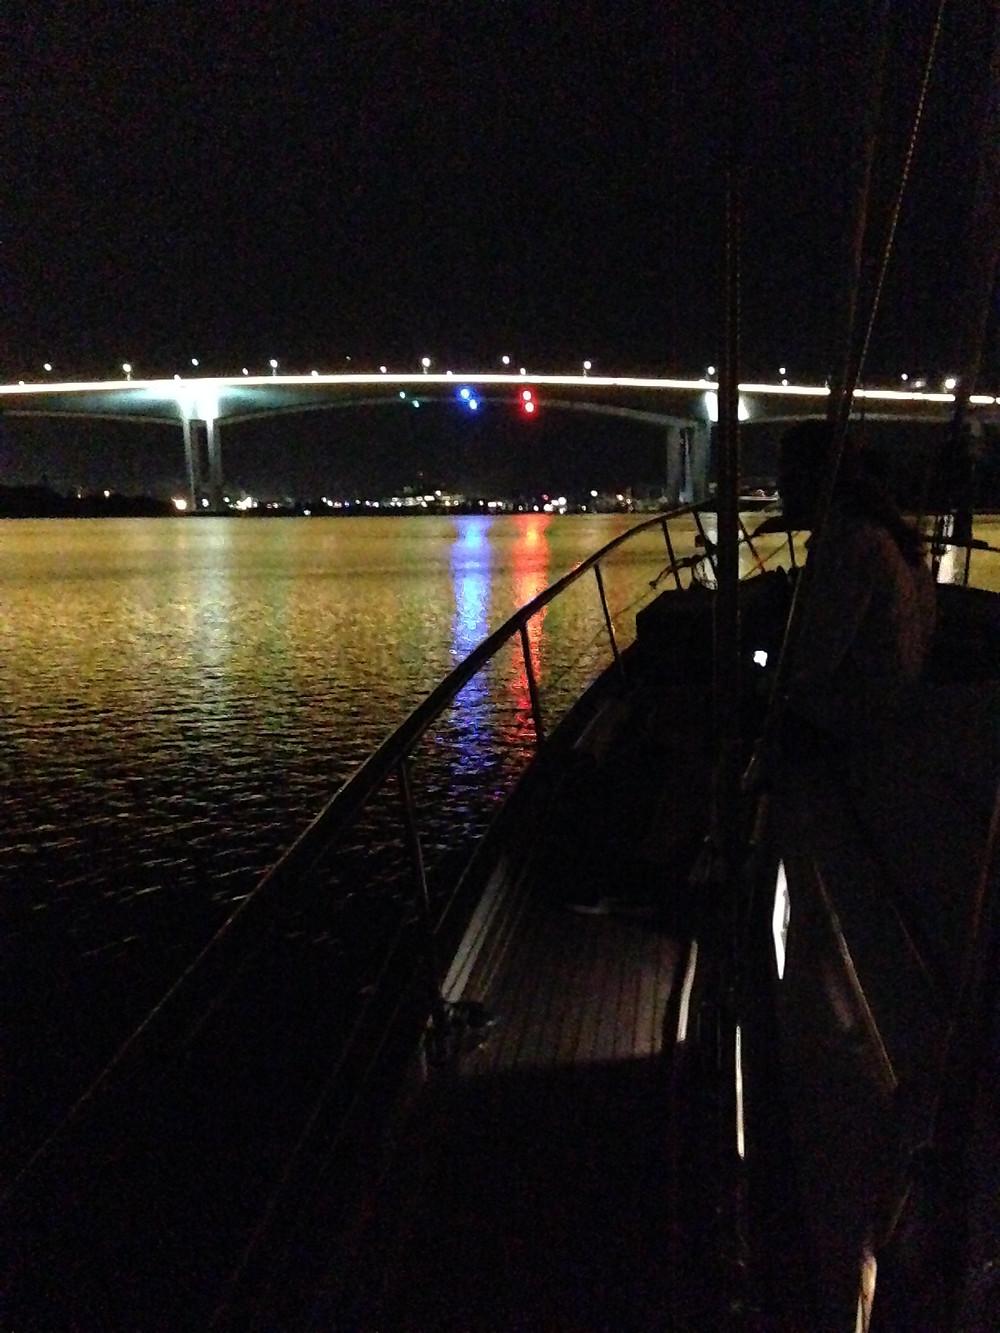 Heading out under the Gateway Bridge